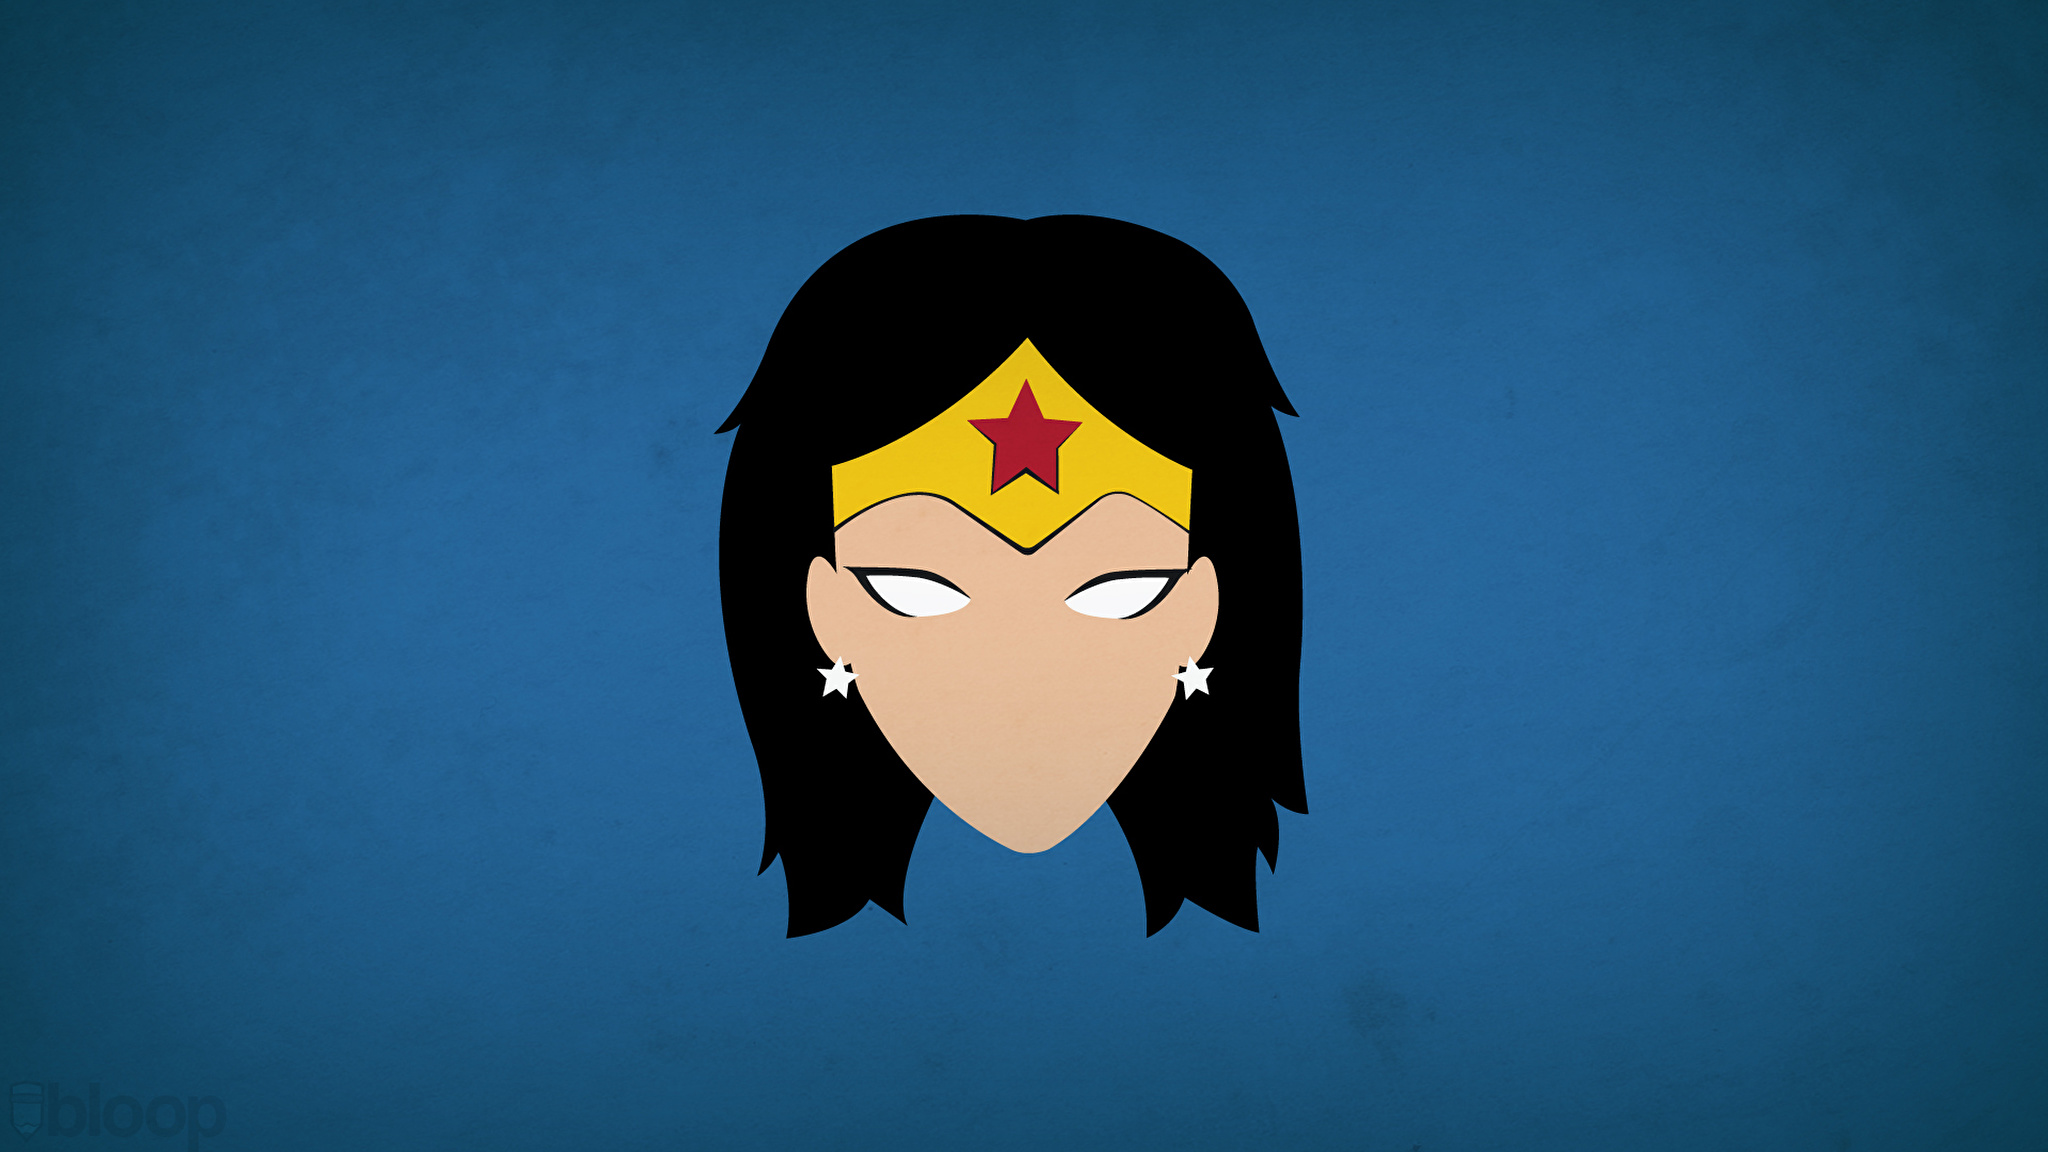 2048x1152 Photo Heroes Comics Wonder Woman Hero Head Vector Graphics 2048x1152